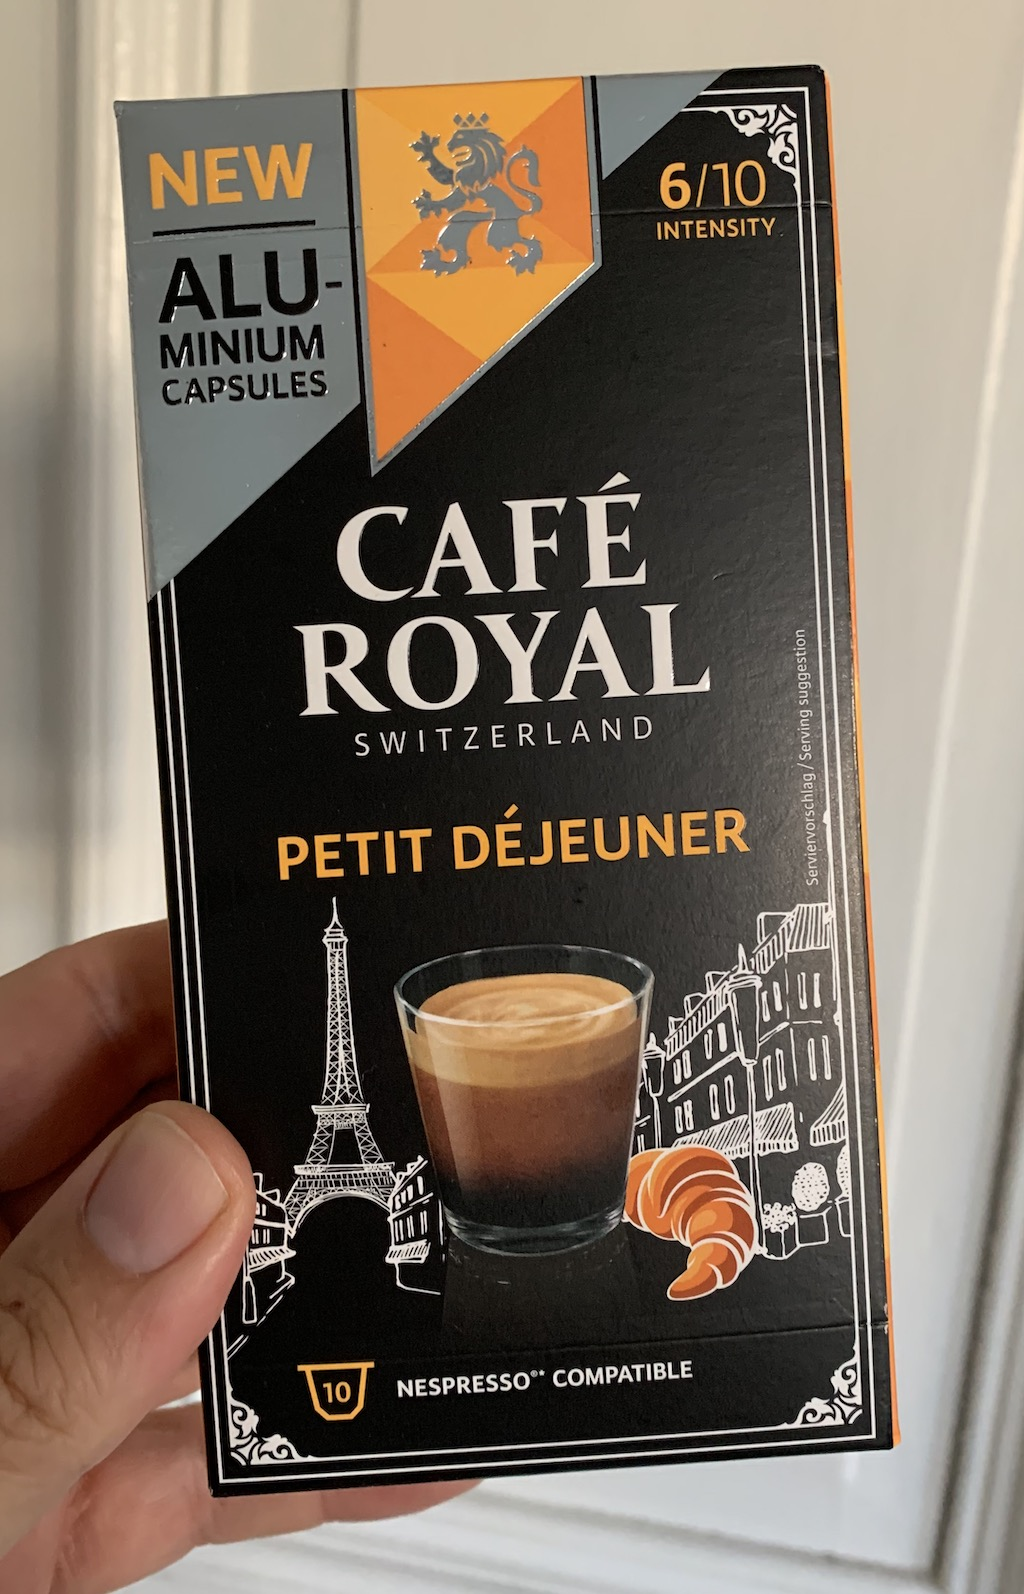 Café Royal Switzerland Petit Dejeuner 10 Kapseln